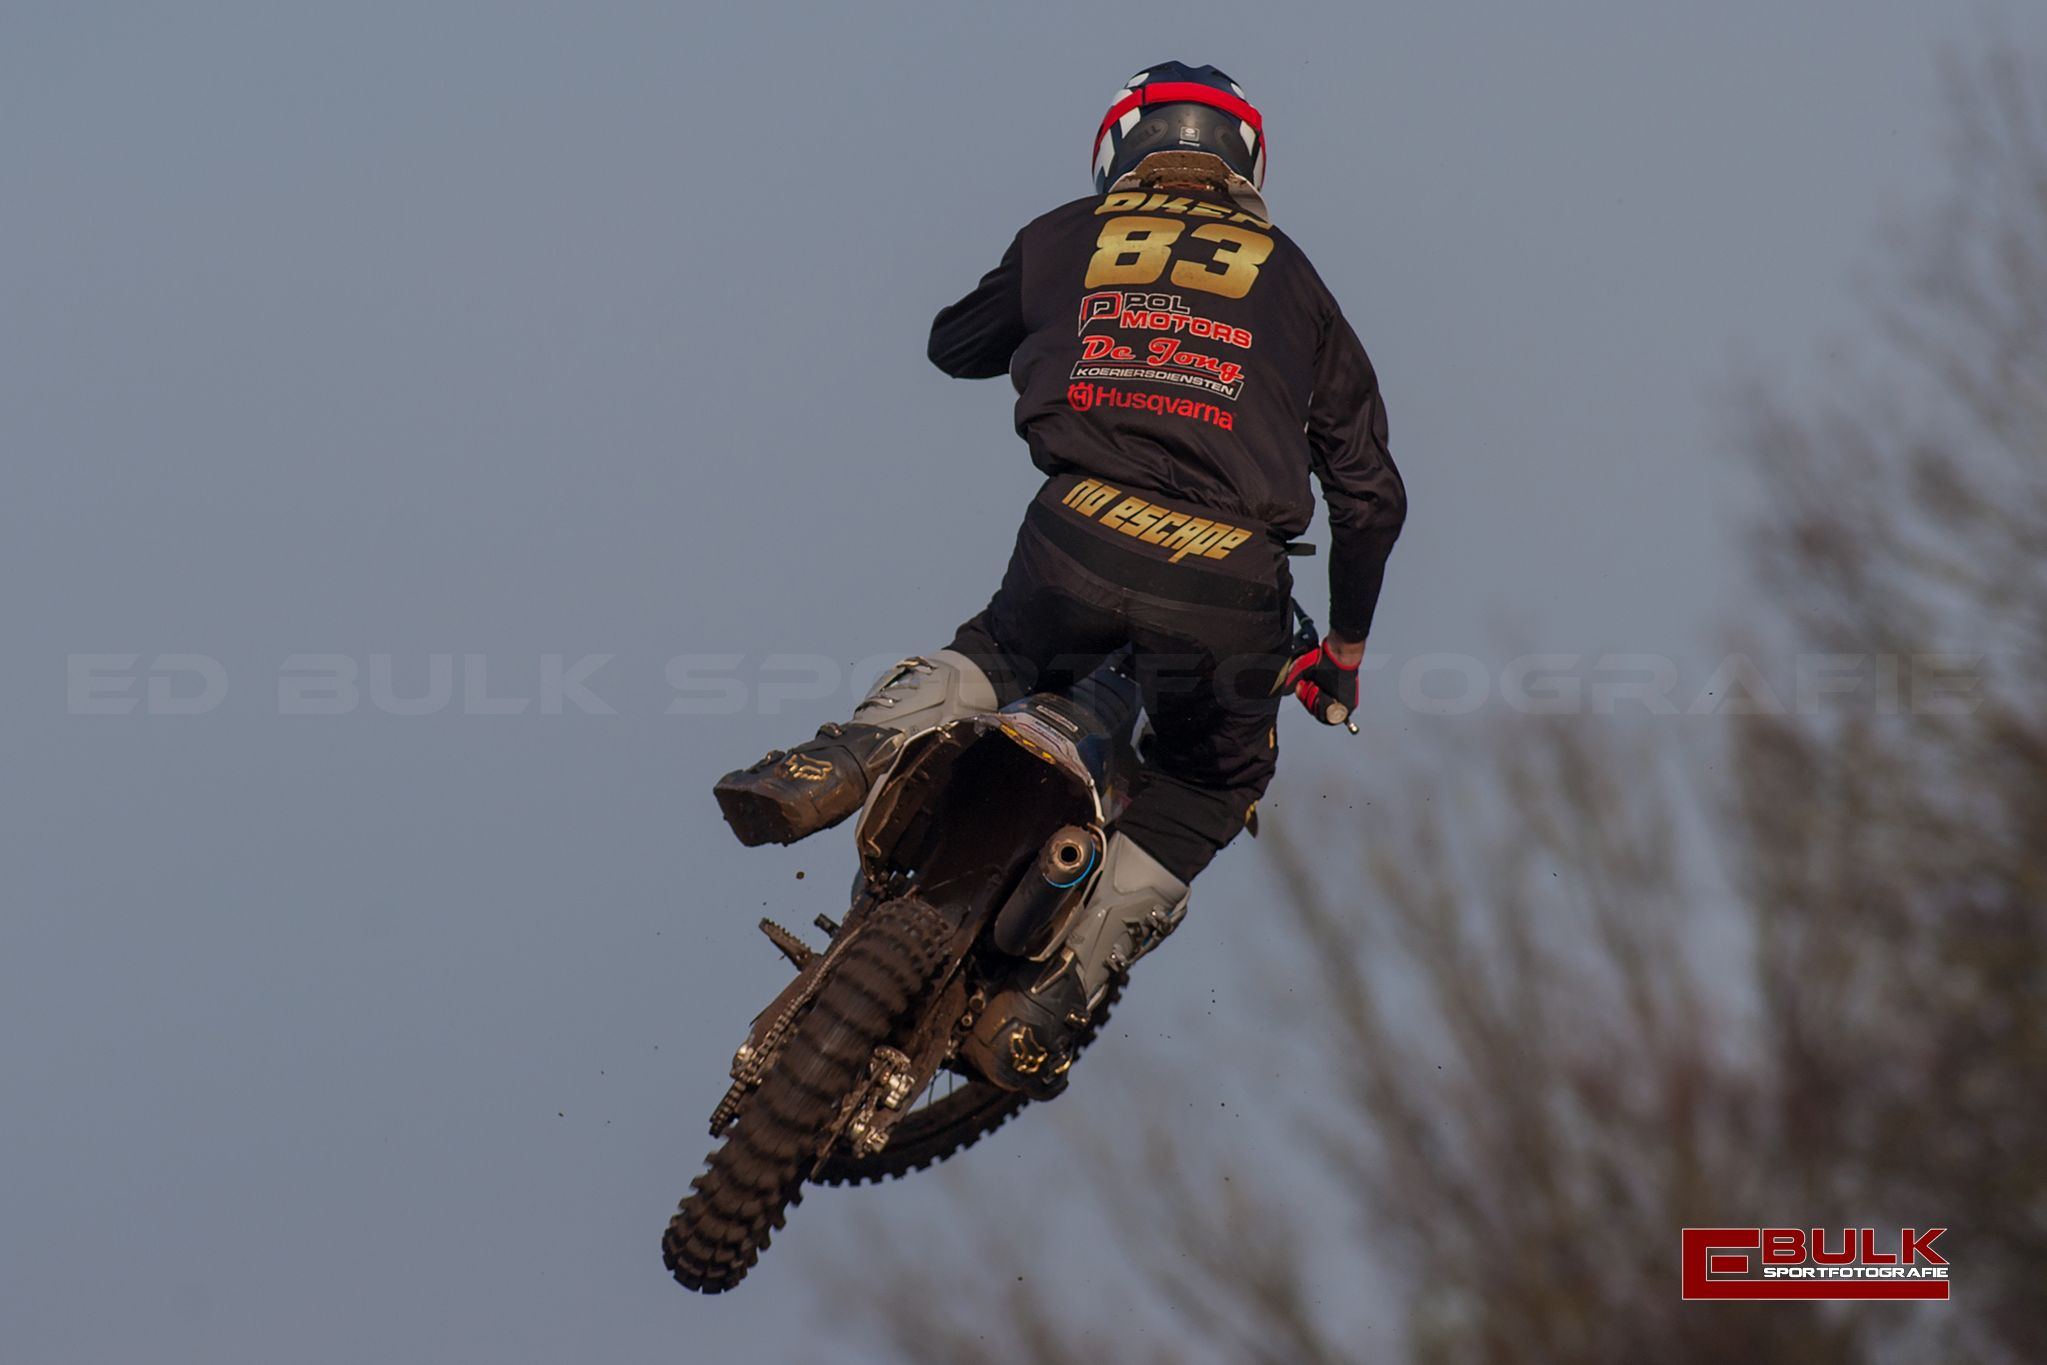 ebs_0567-ed_bulk_sportfotografie